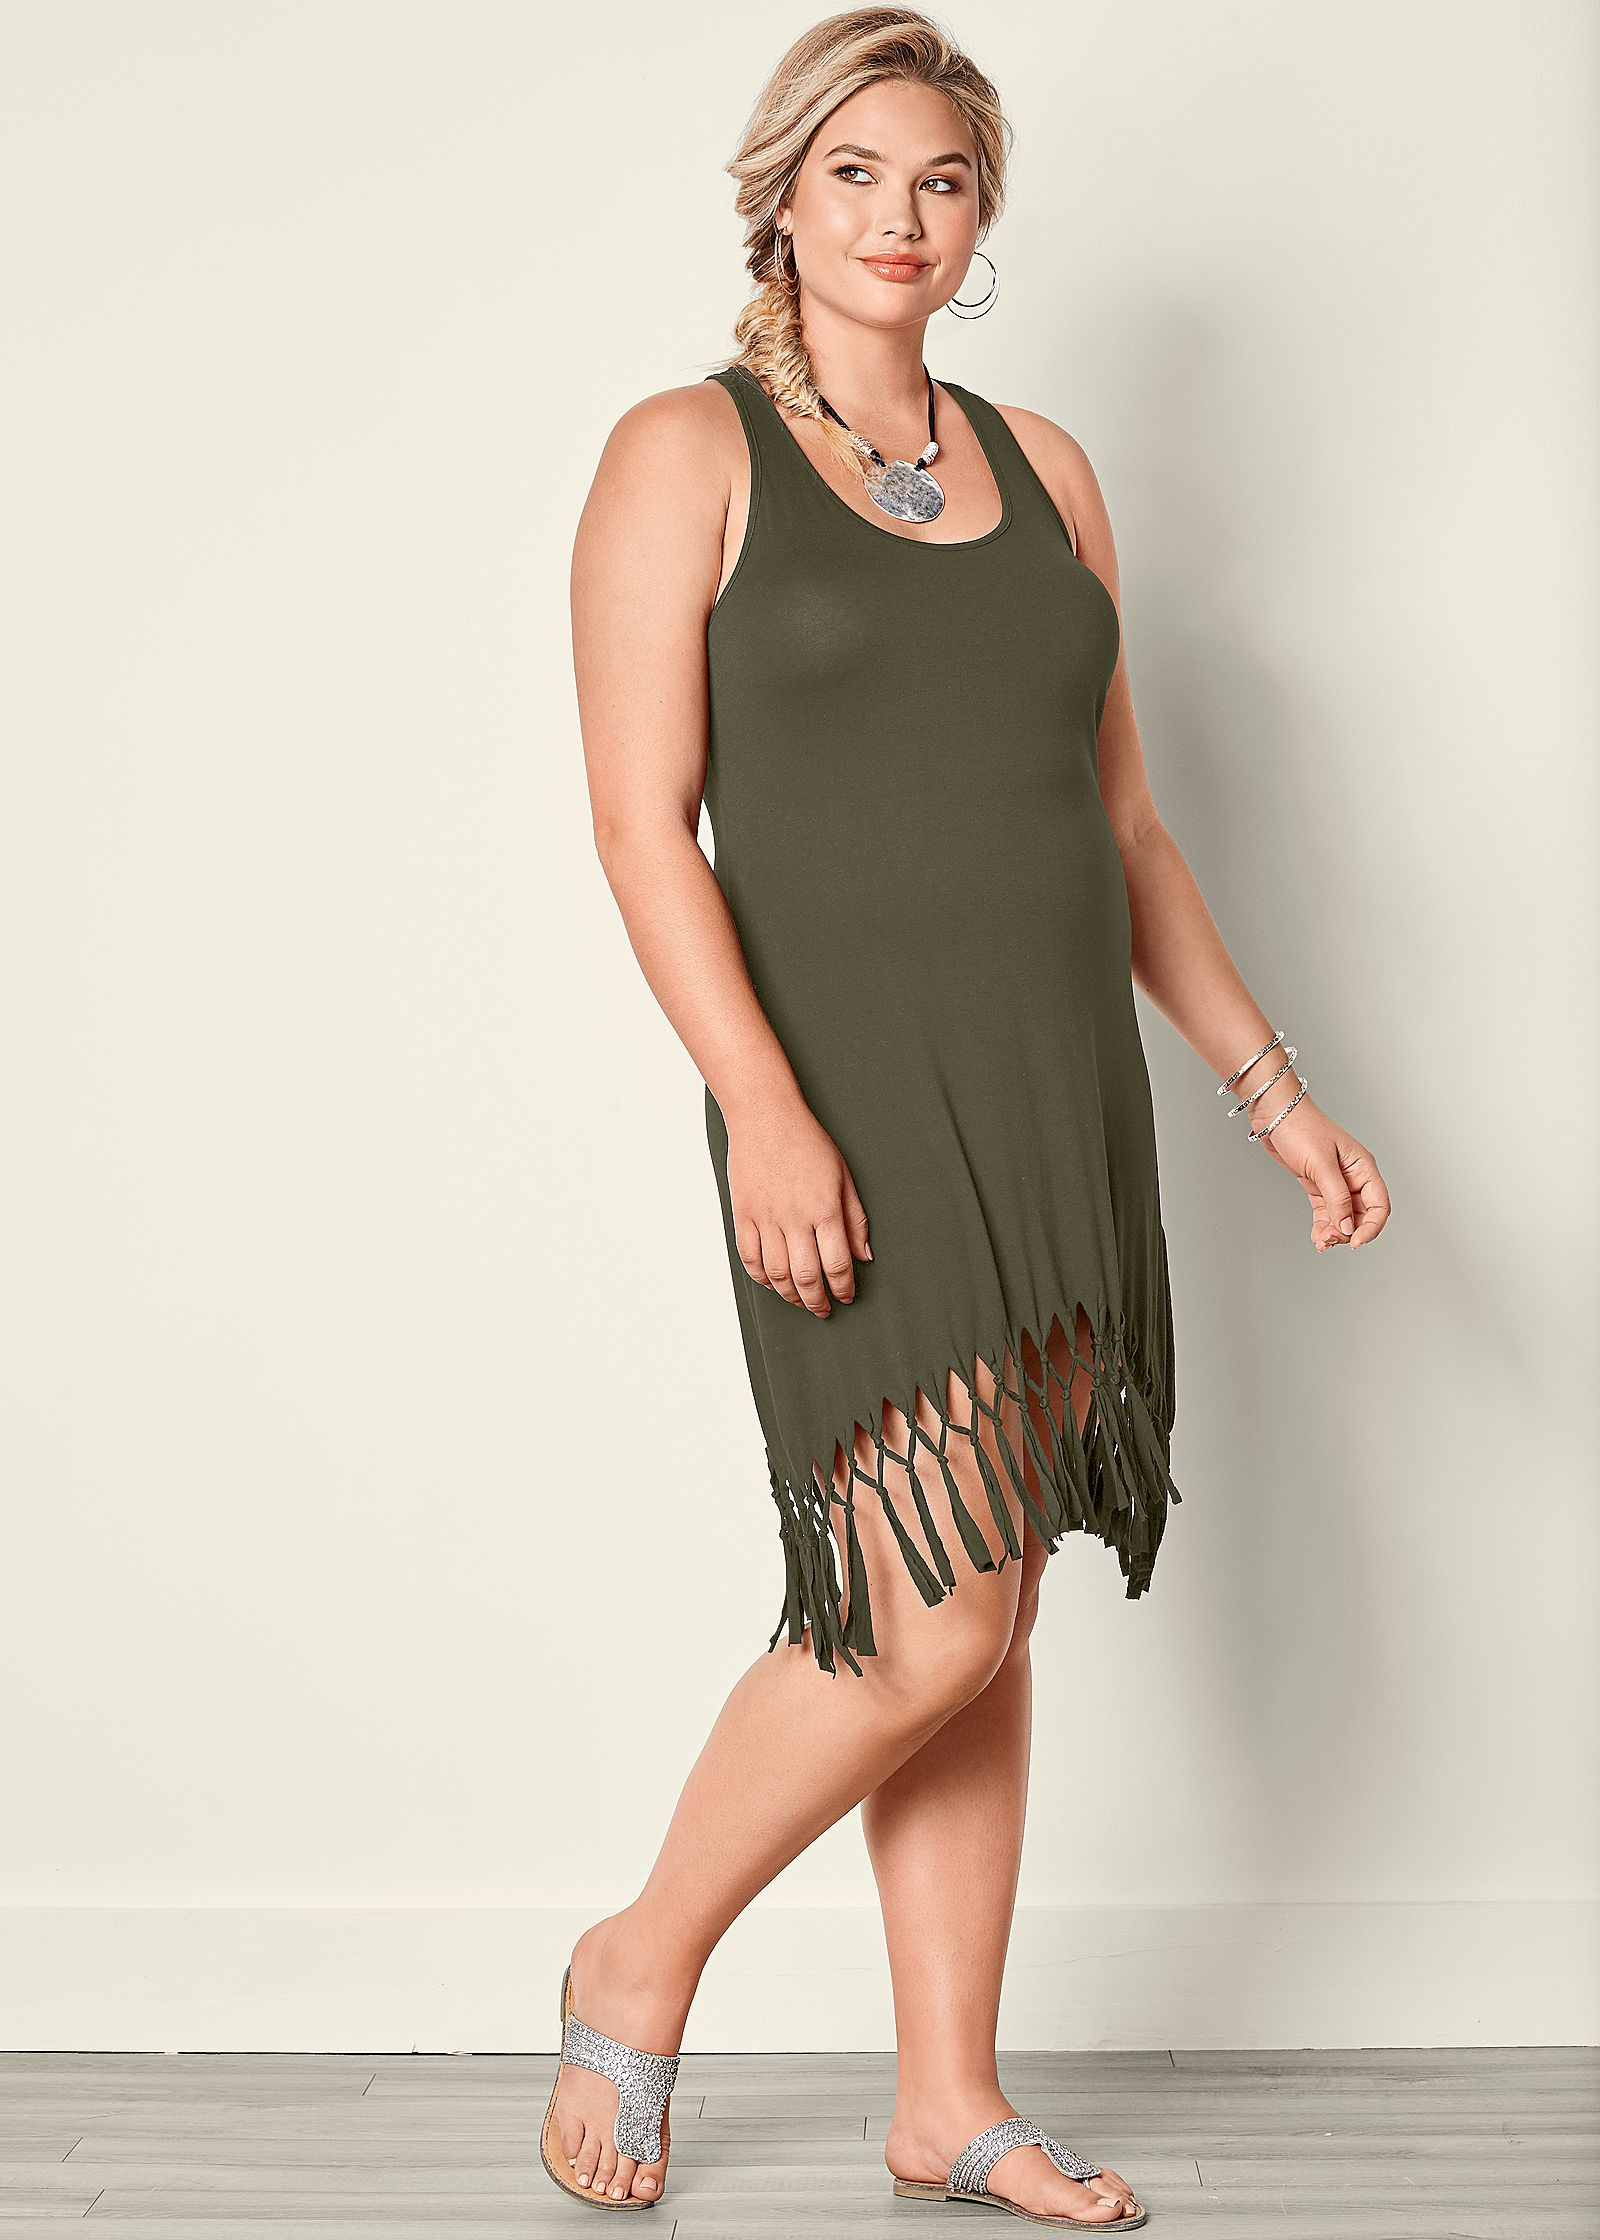 Fringe dress plus size for women cheap